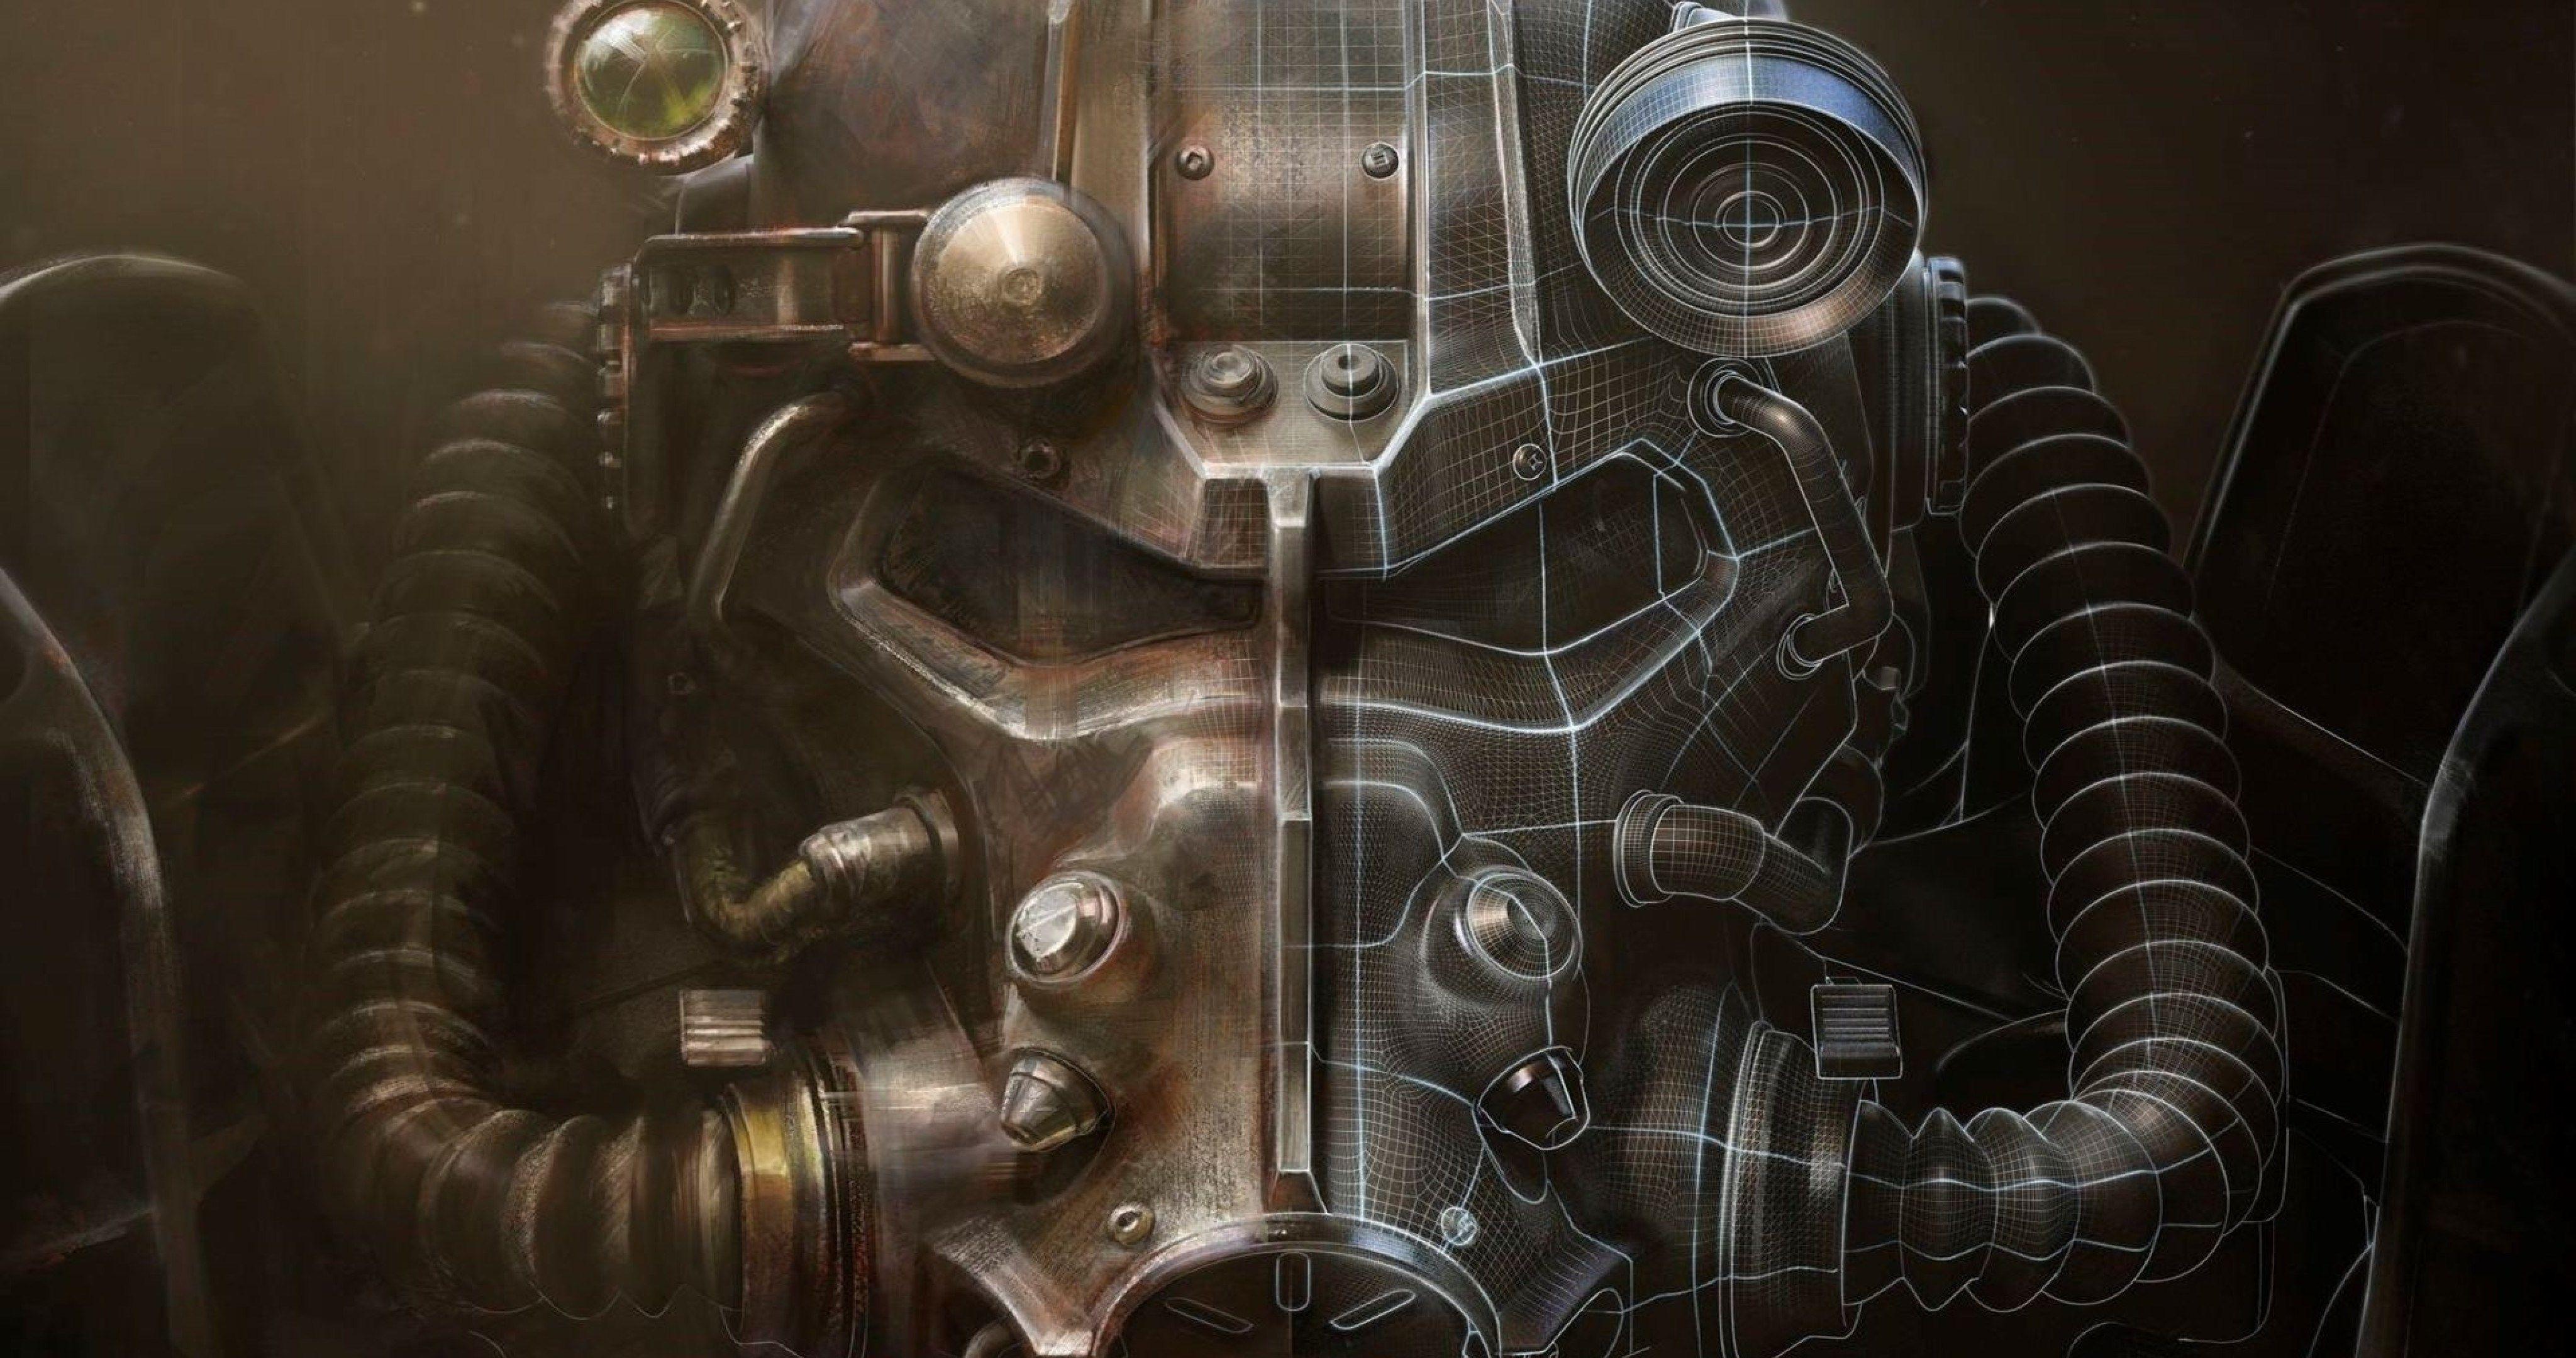 Fallout 4 Armor 4k Ultra Hd Wallpaper Fallout Wallpaper Fallout Power Armor Fallout 4 Power Armor